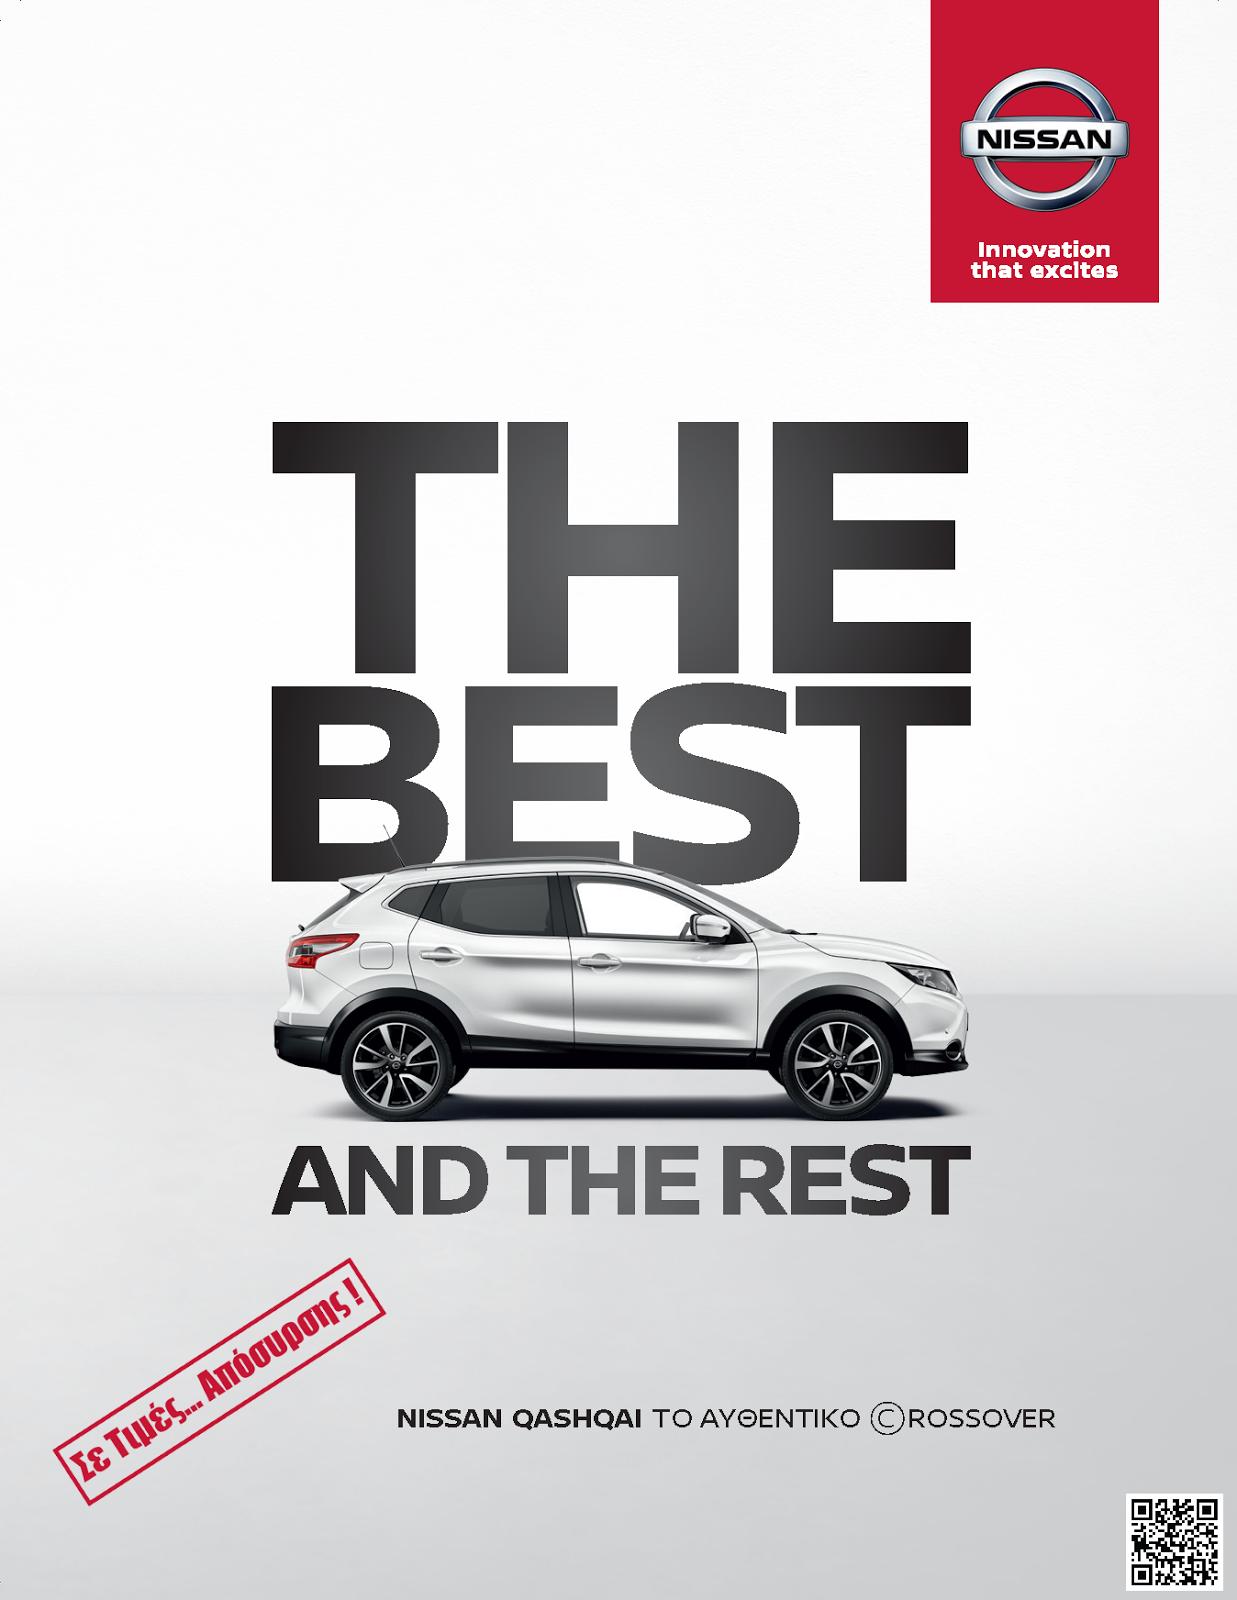 QASHQAI2BAPOSIRSI 1 Το Nissan QASHQAI έως και 4.100 ευρώ φθηνότερα Nissan, Nissan Qashqai, αγορά, προσφορές